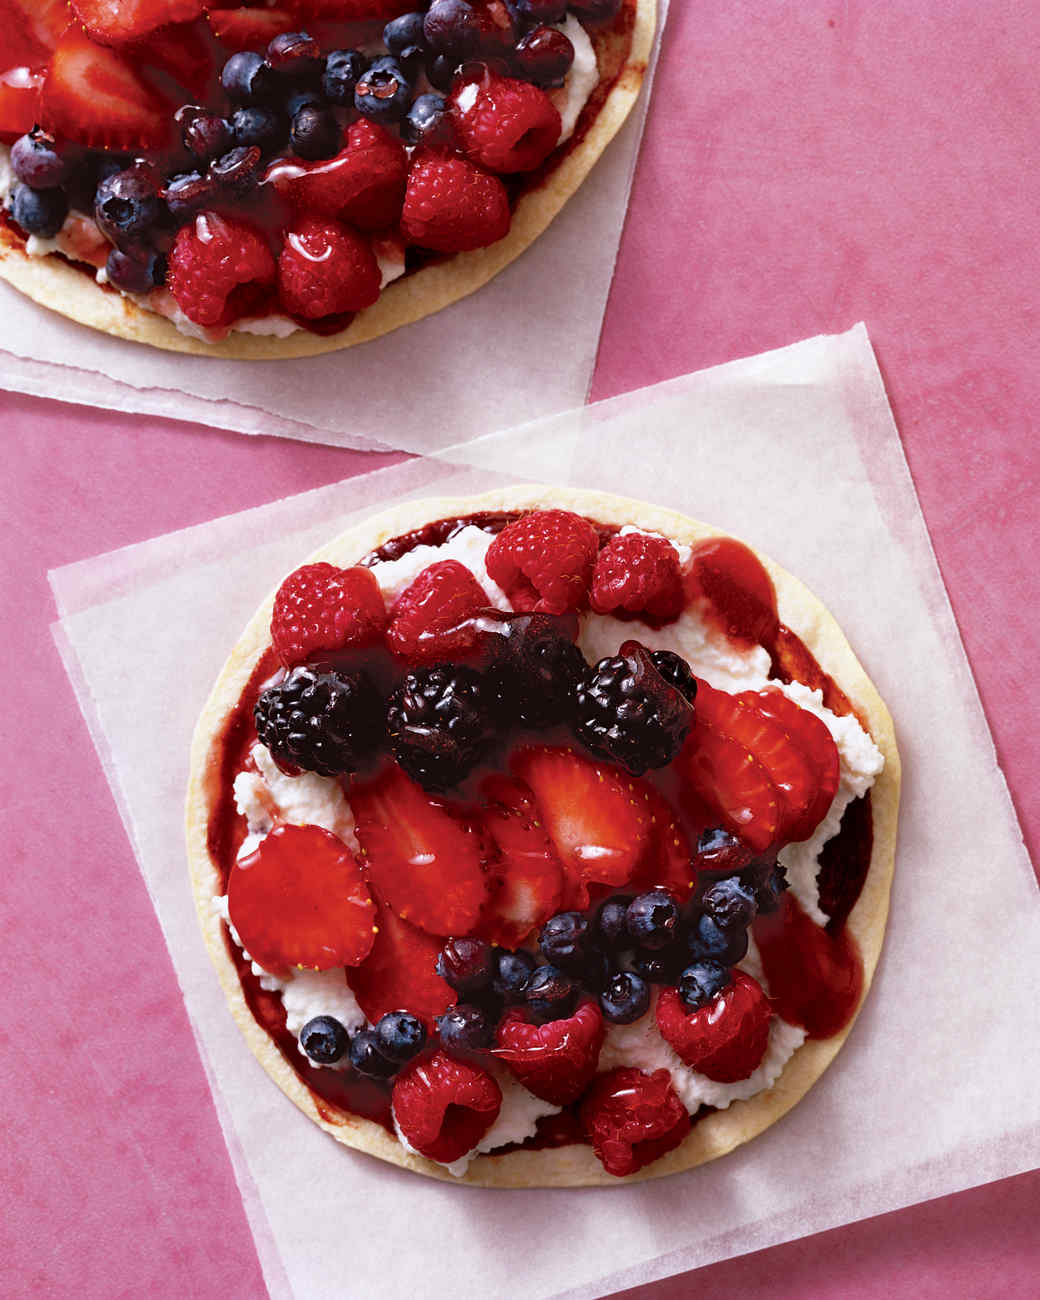 bas_jul06_berry_pizza.jpg